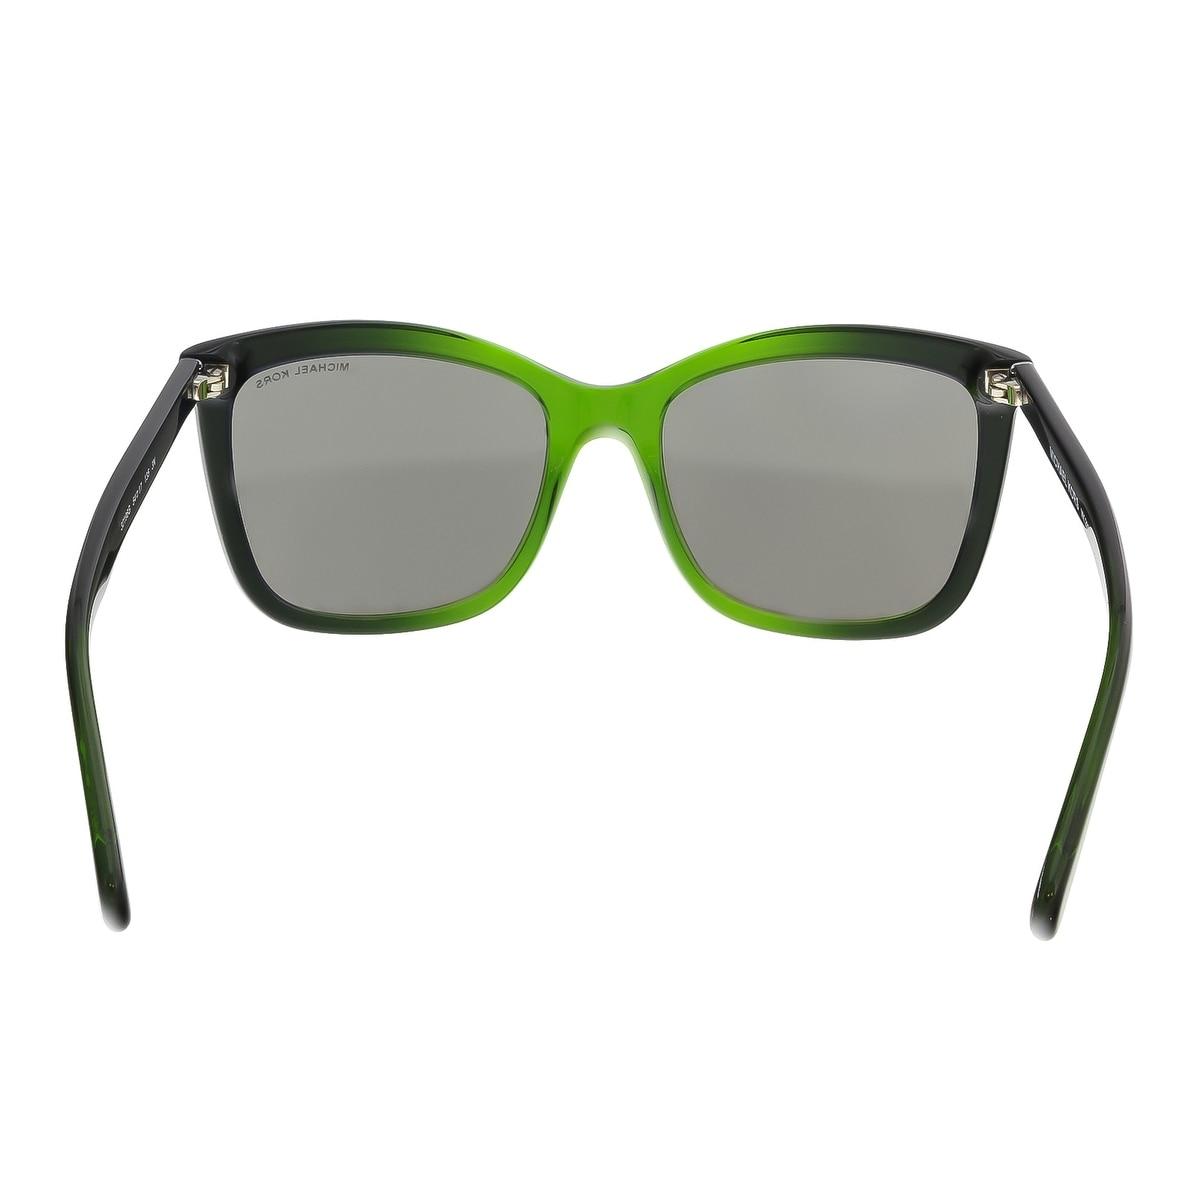 75bcf2b583ccf Shop Michael Kors MK2039 32196G CORNELIA Green Gradient Square Sunglasses -  54-17-135 - Free Shipping Today - Overstock - 18182724